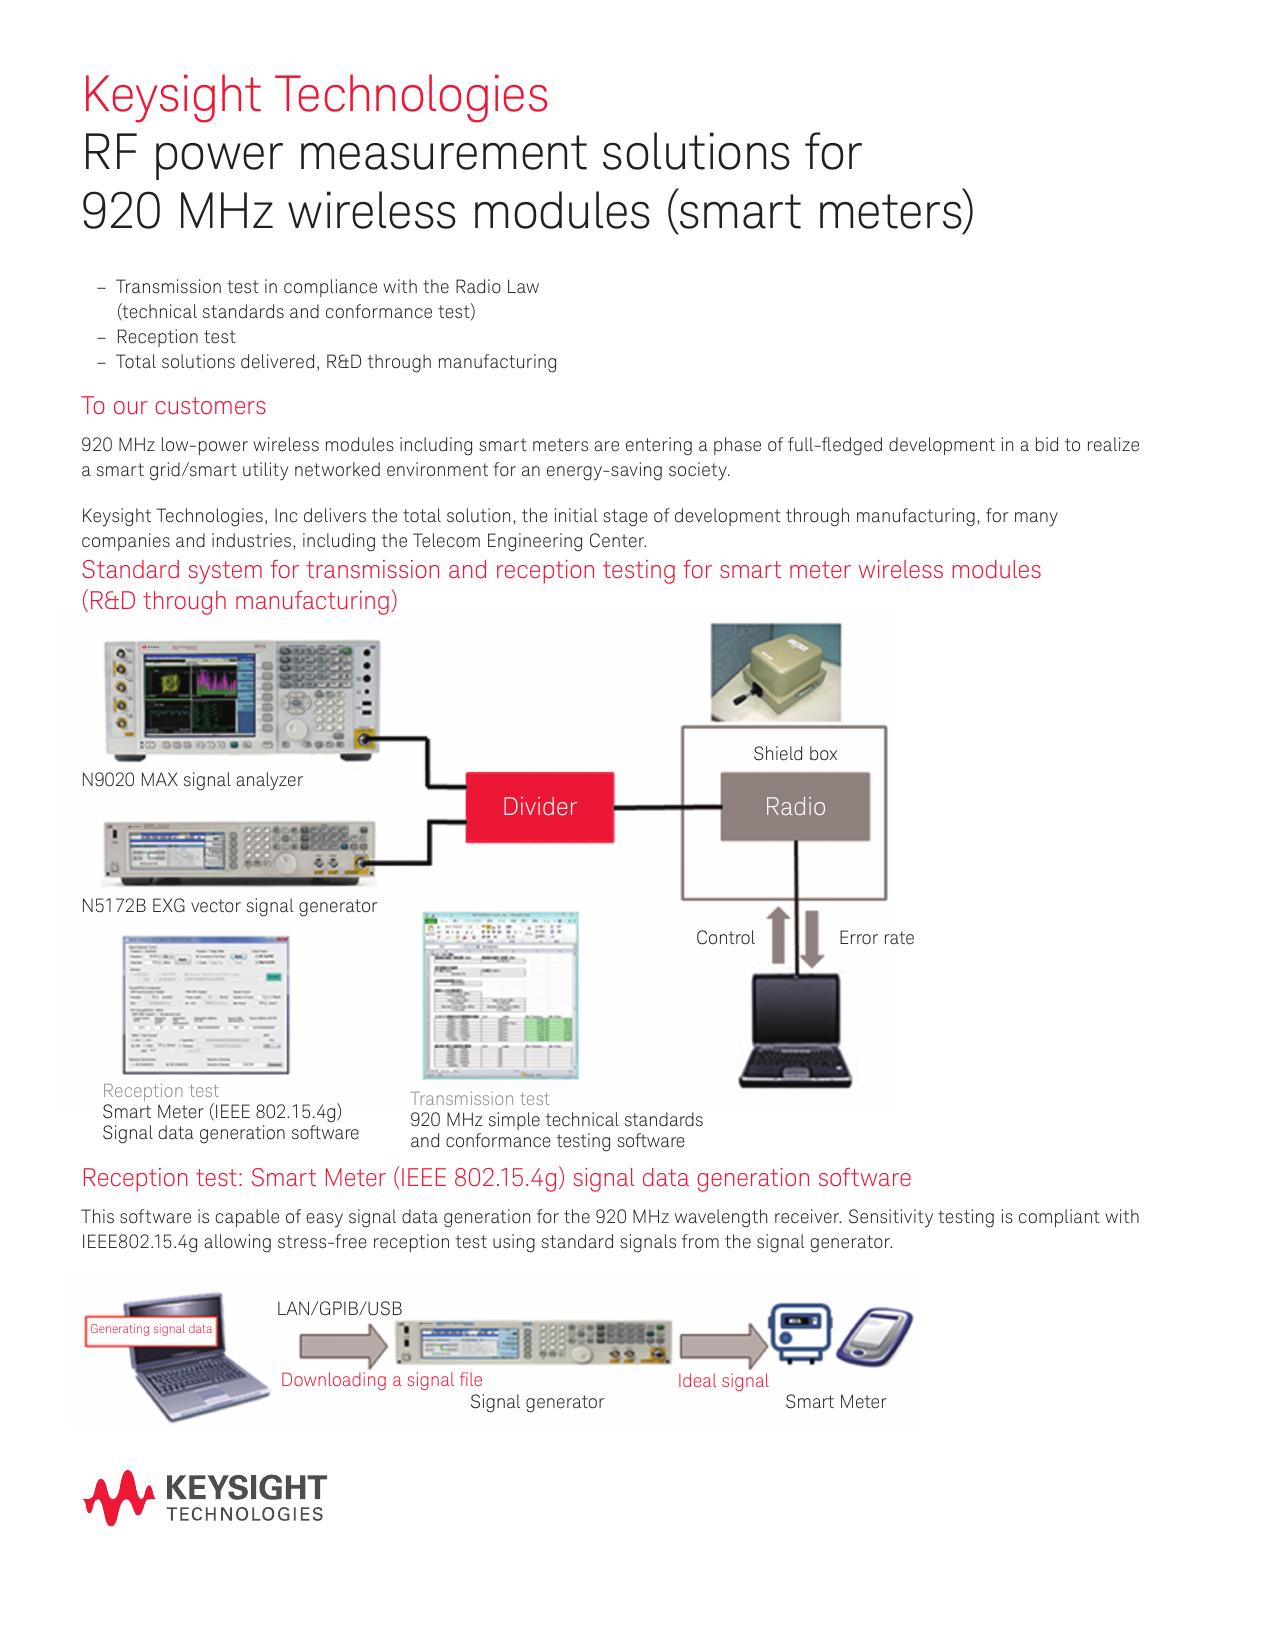 Keysight Technologies RF power measurement solutions for 920